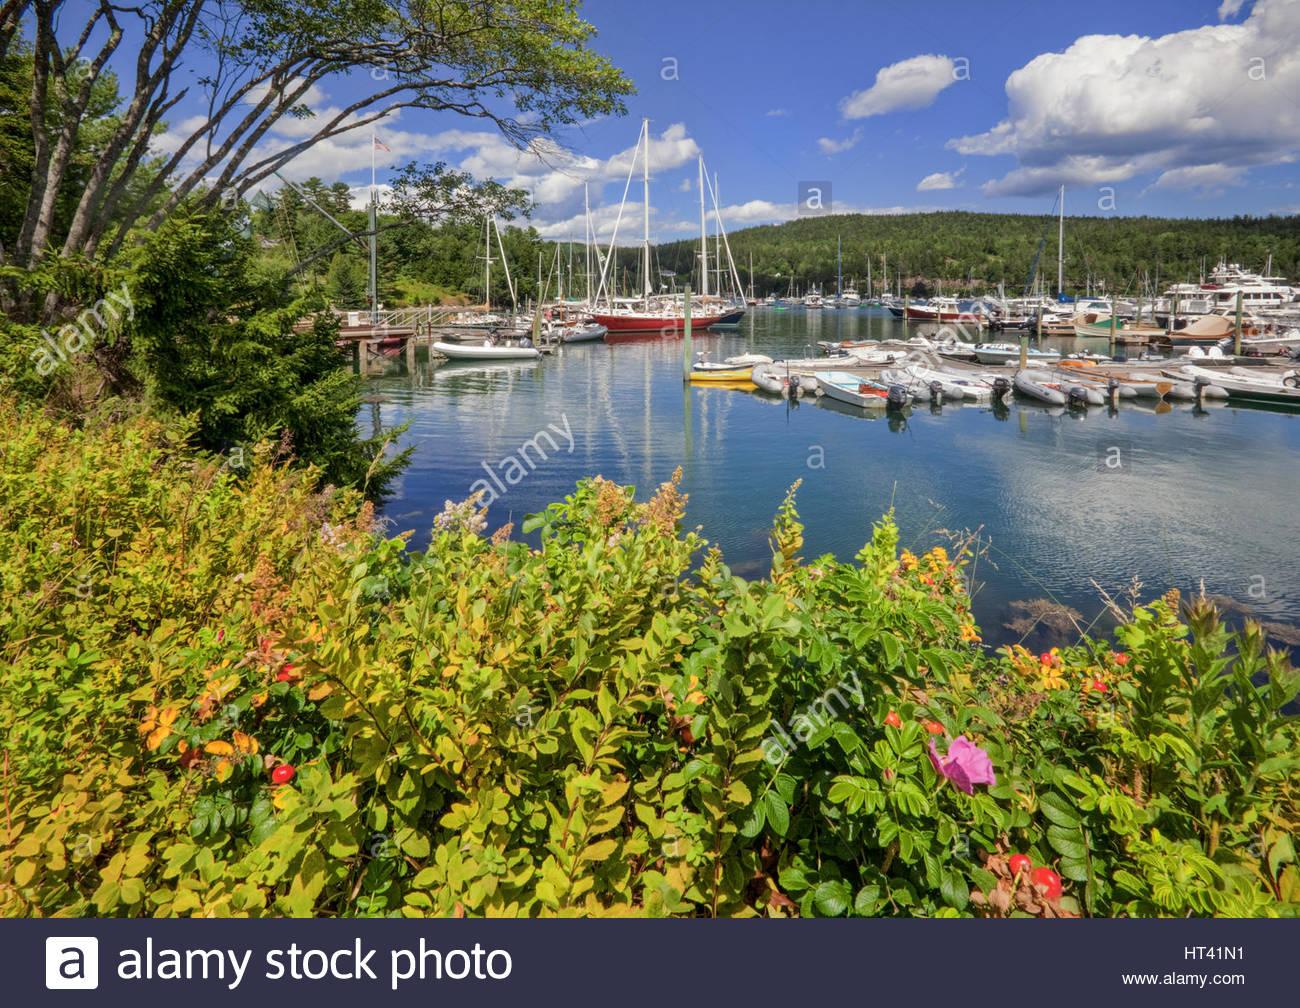 0902-1015  The inner harbor at Northeast Harbor, Mt. Desert Island, Maine.  Acadia National Park. - Stock Image